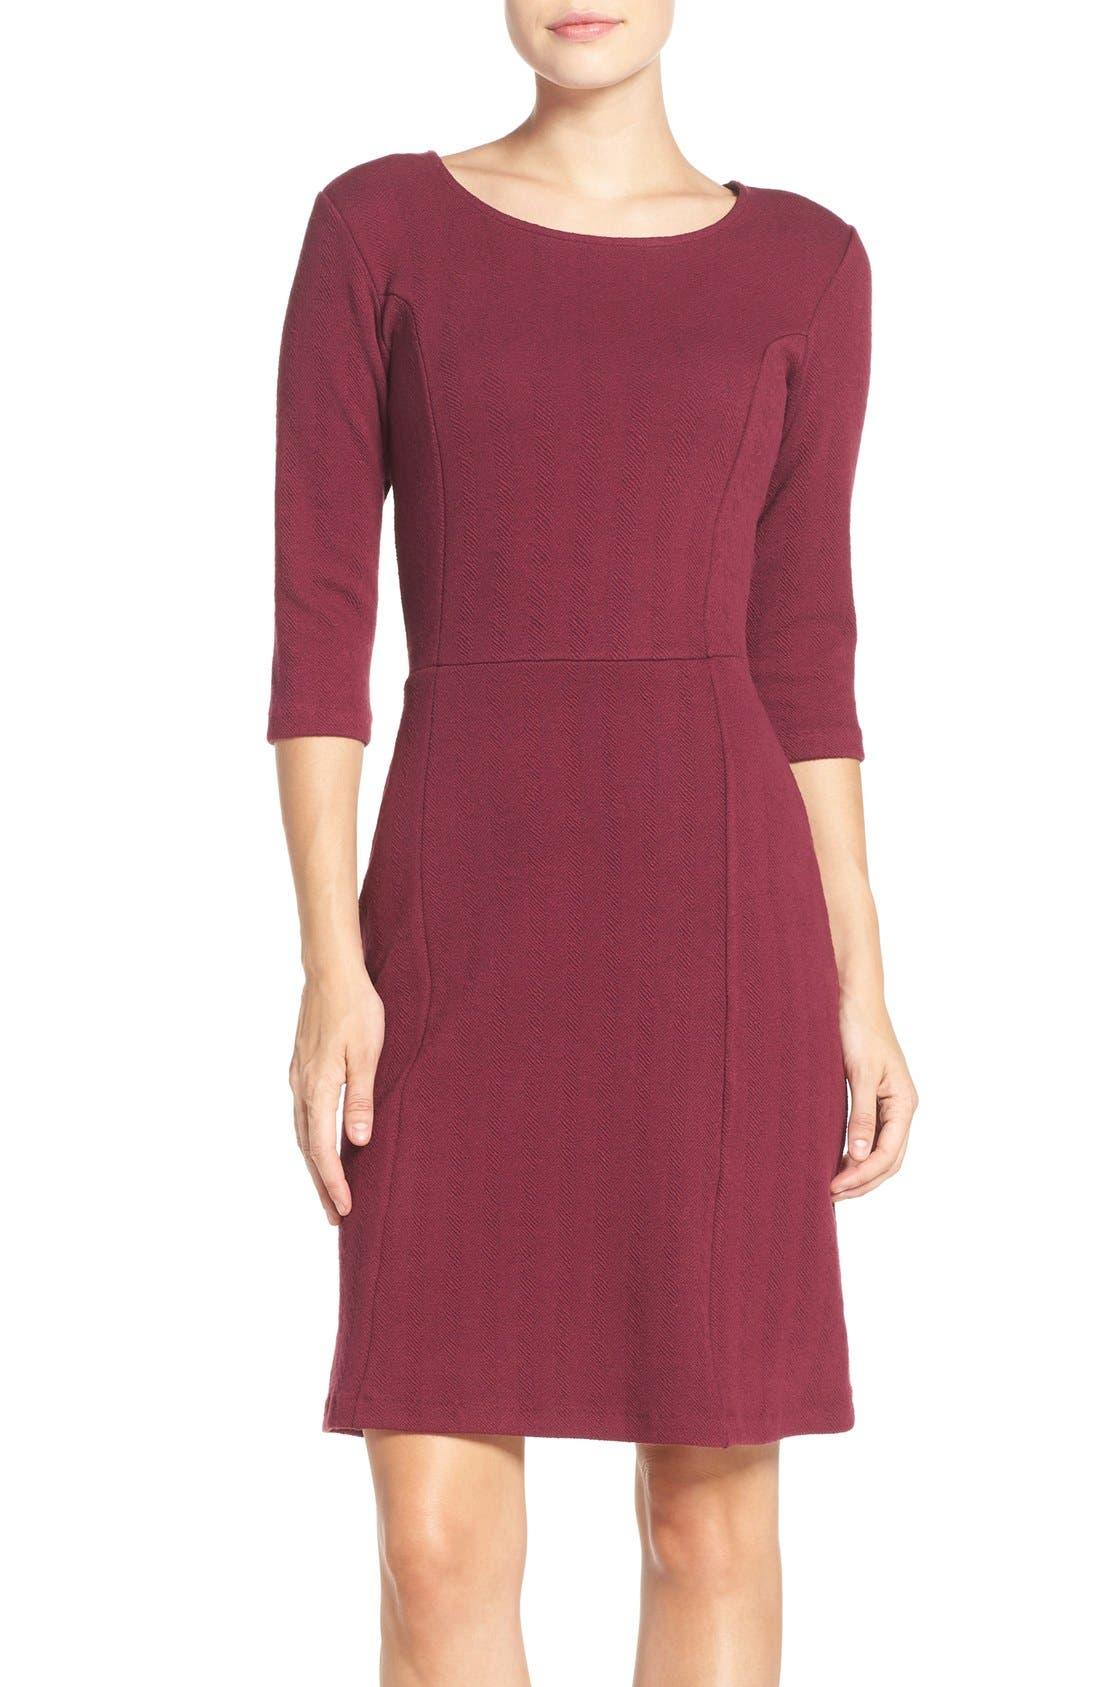 Main Image - Leota 'Avery' Jacquard Knit Sheath Dress